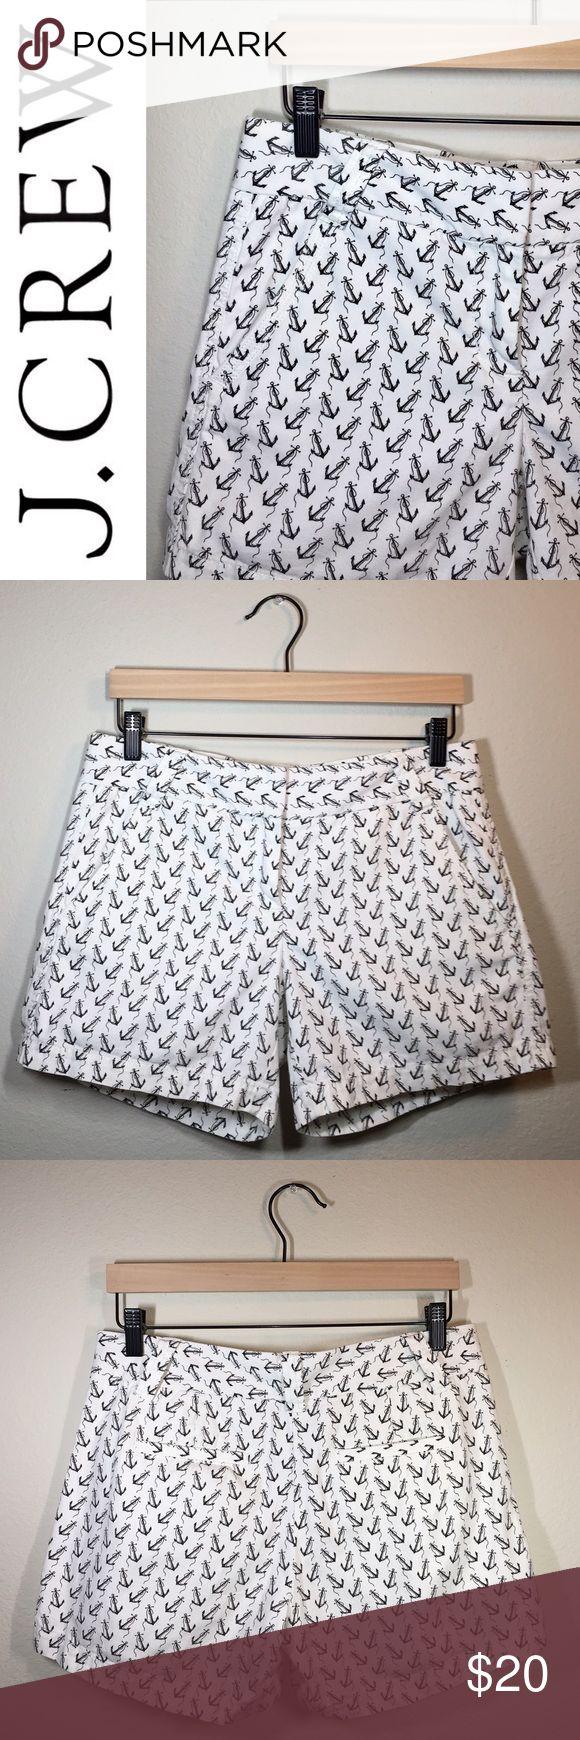 "J. Crew Anchor Shorts ✔️White Shorts with Anchor ⚓️ Pattern ✔️J. Crew City Fit ✔️Inseam: 5"" ✔️Front Slant Pockets ✔️100% Cotton ✔️Excellent Condition J. Crew Shorts"